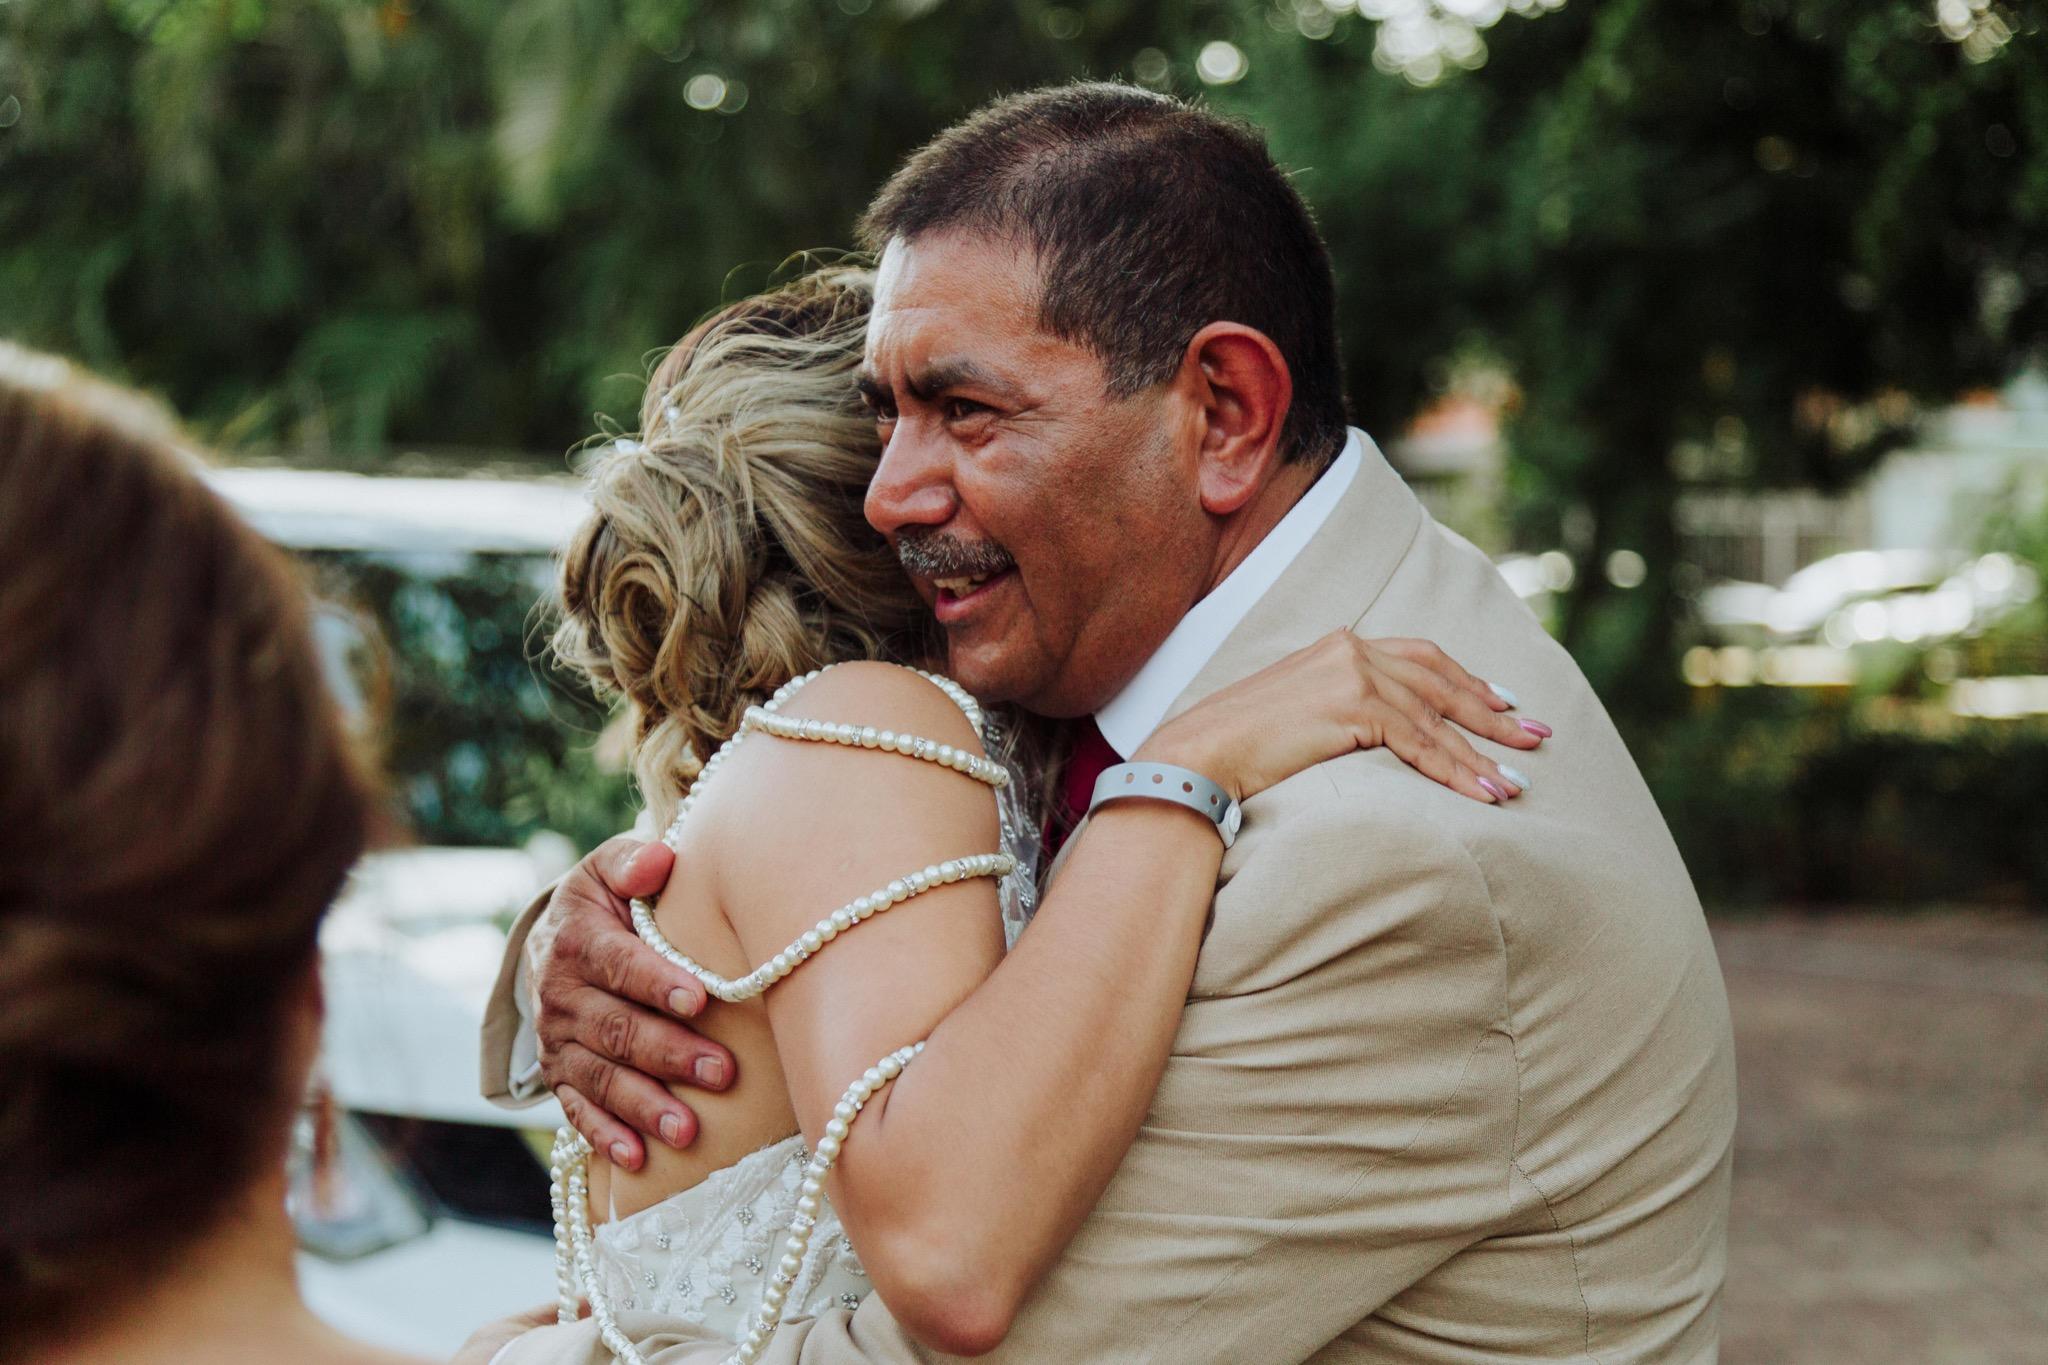 Javier_noriega_fotografo_bodas_profesional_zacatecas_mexico_mazatlan_sinaloa_photographer_weddings35